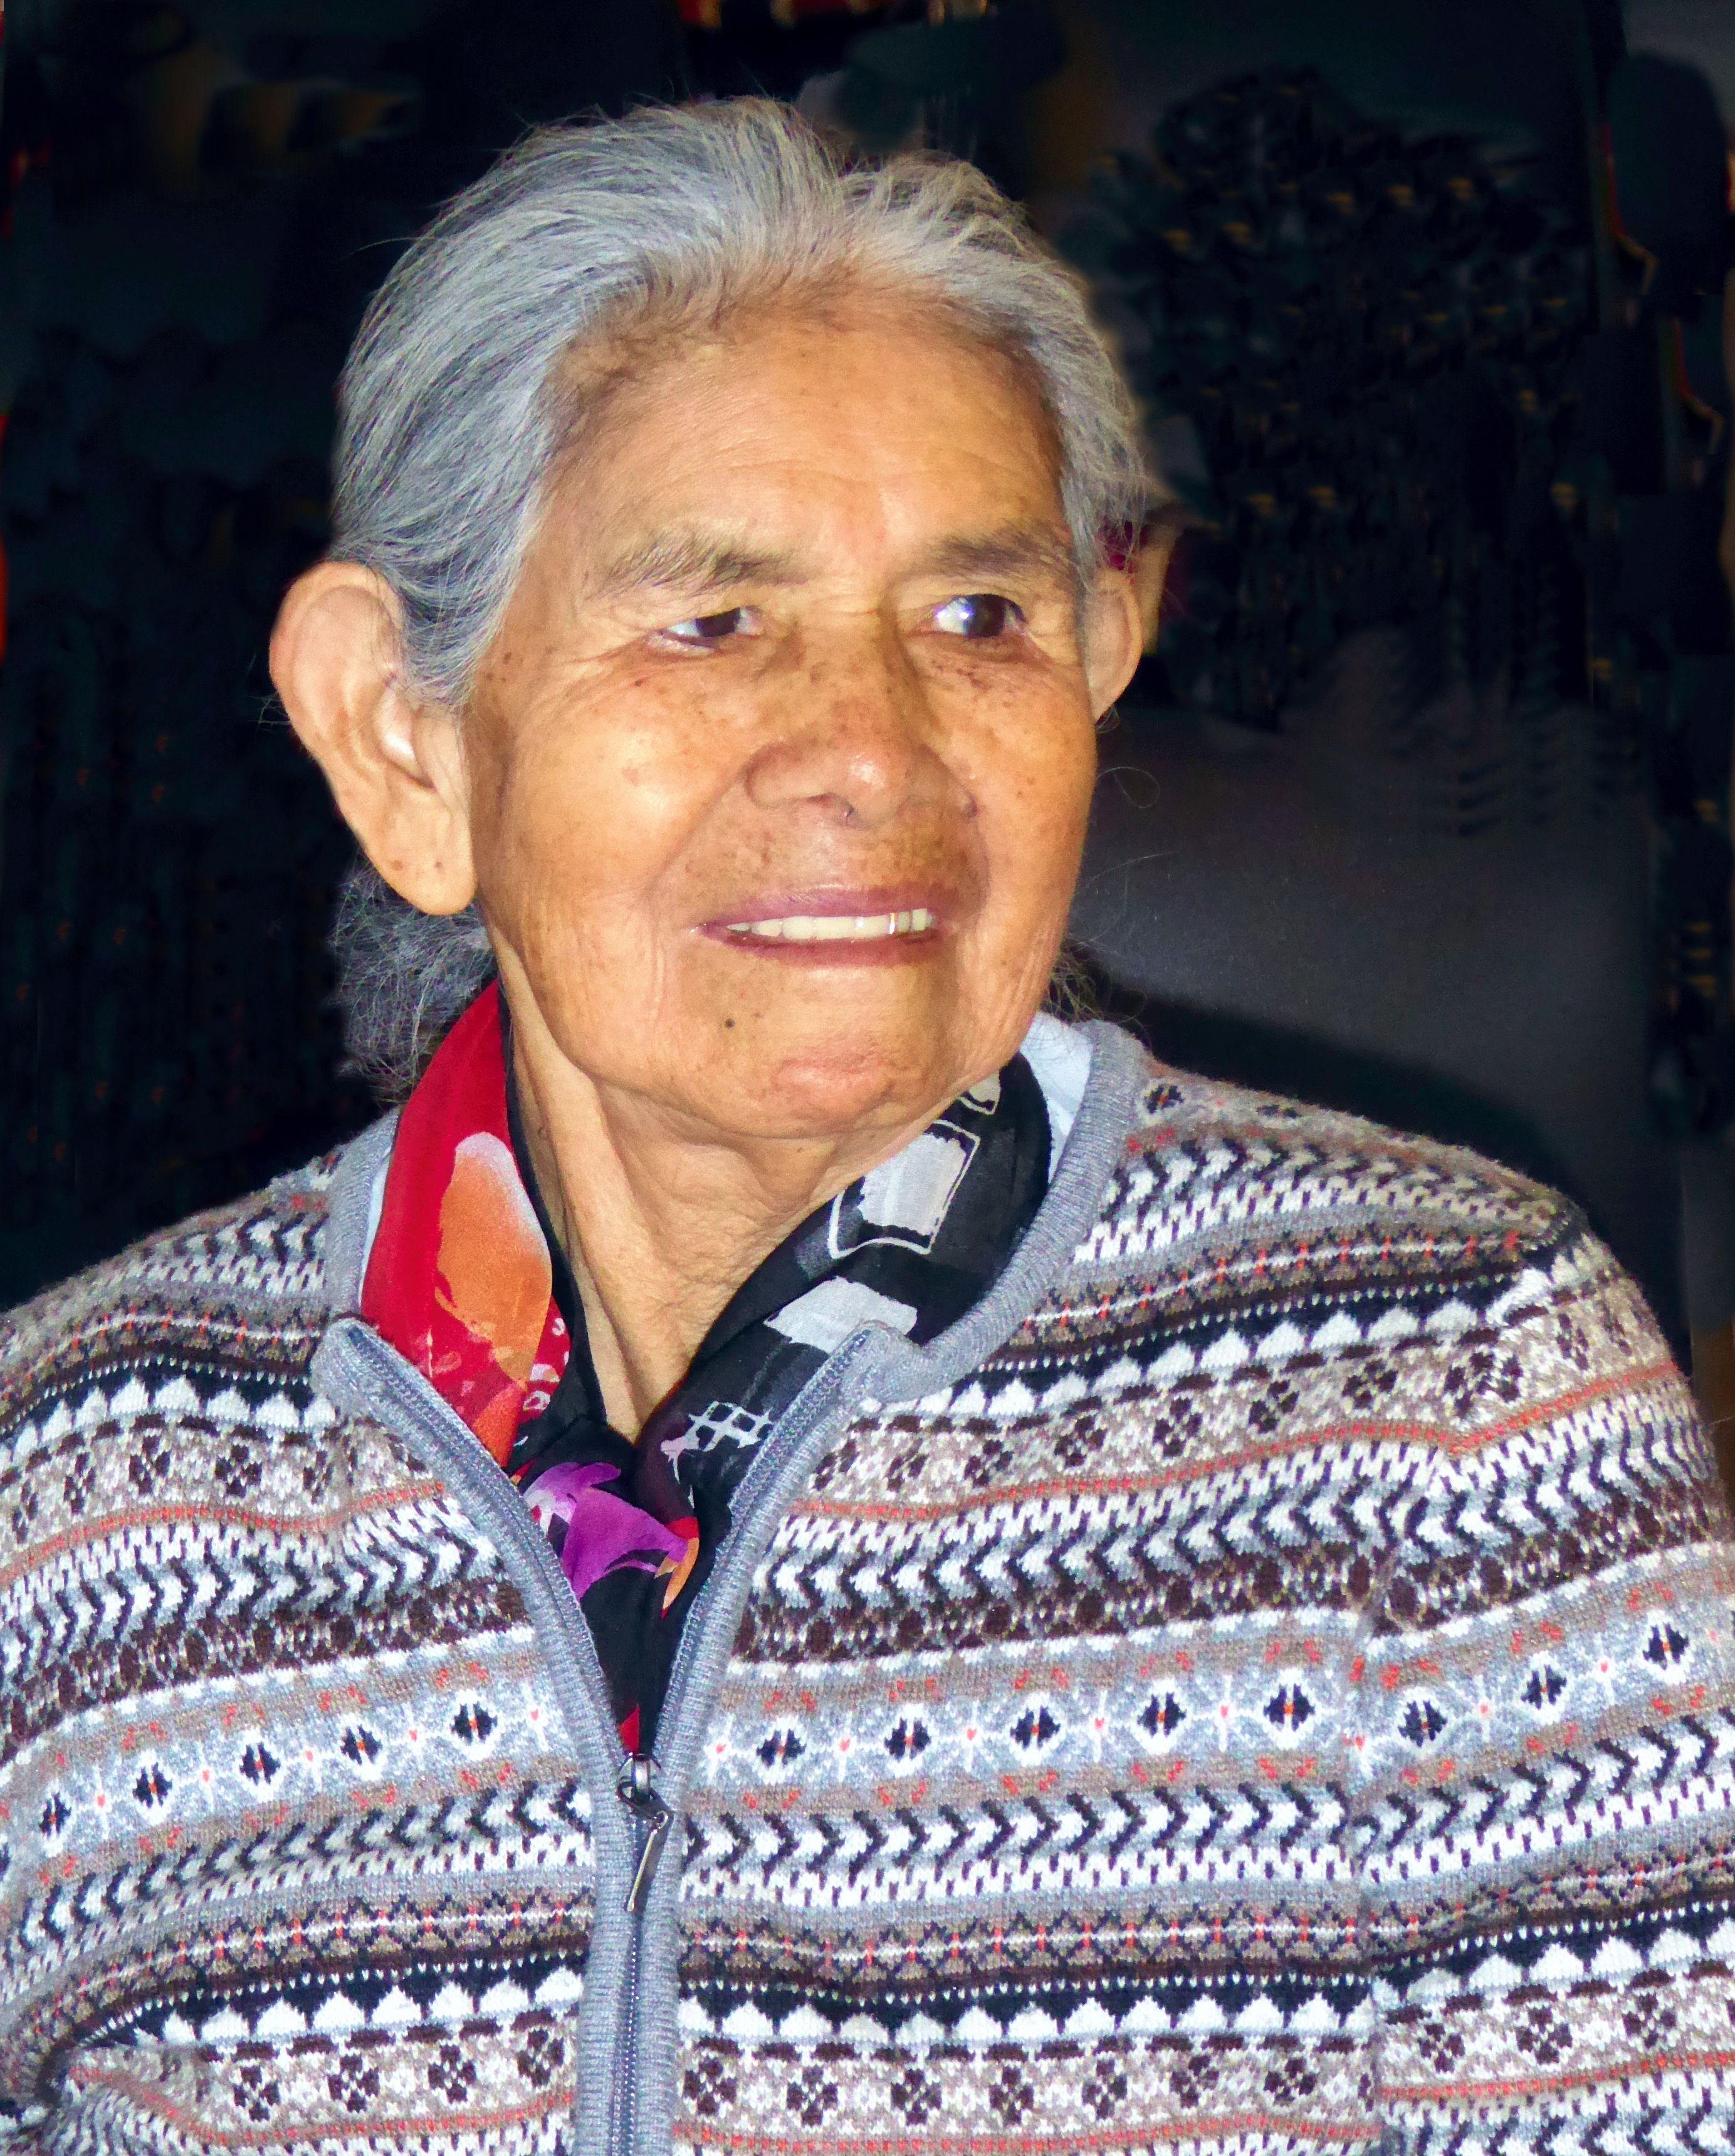 heiße peruanische Frau